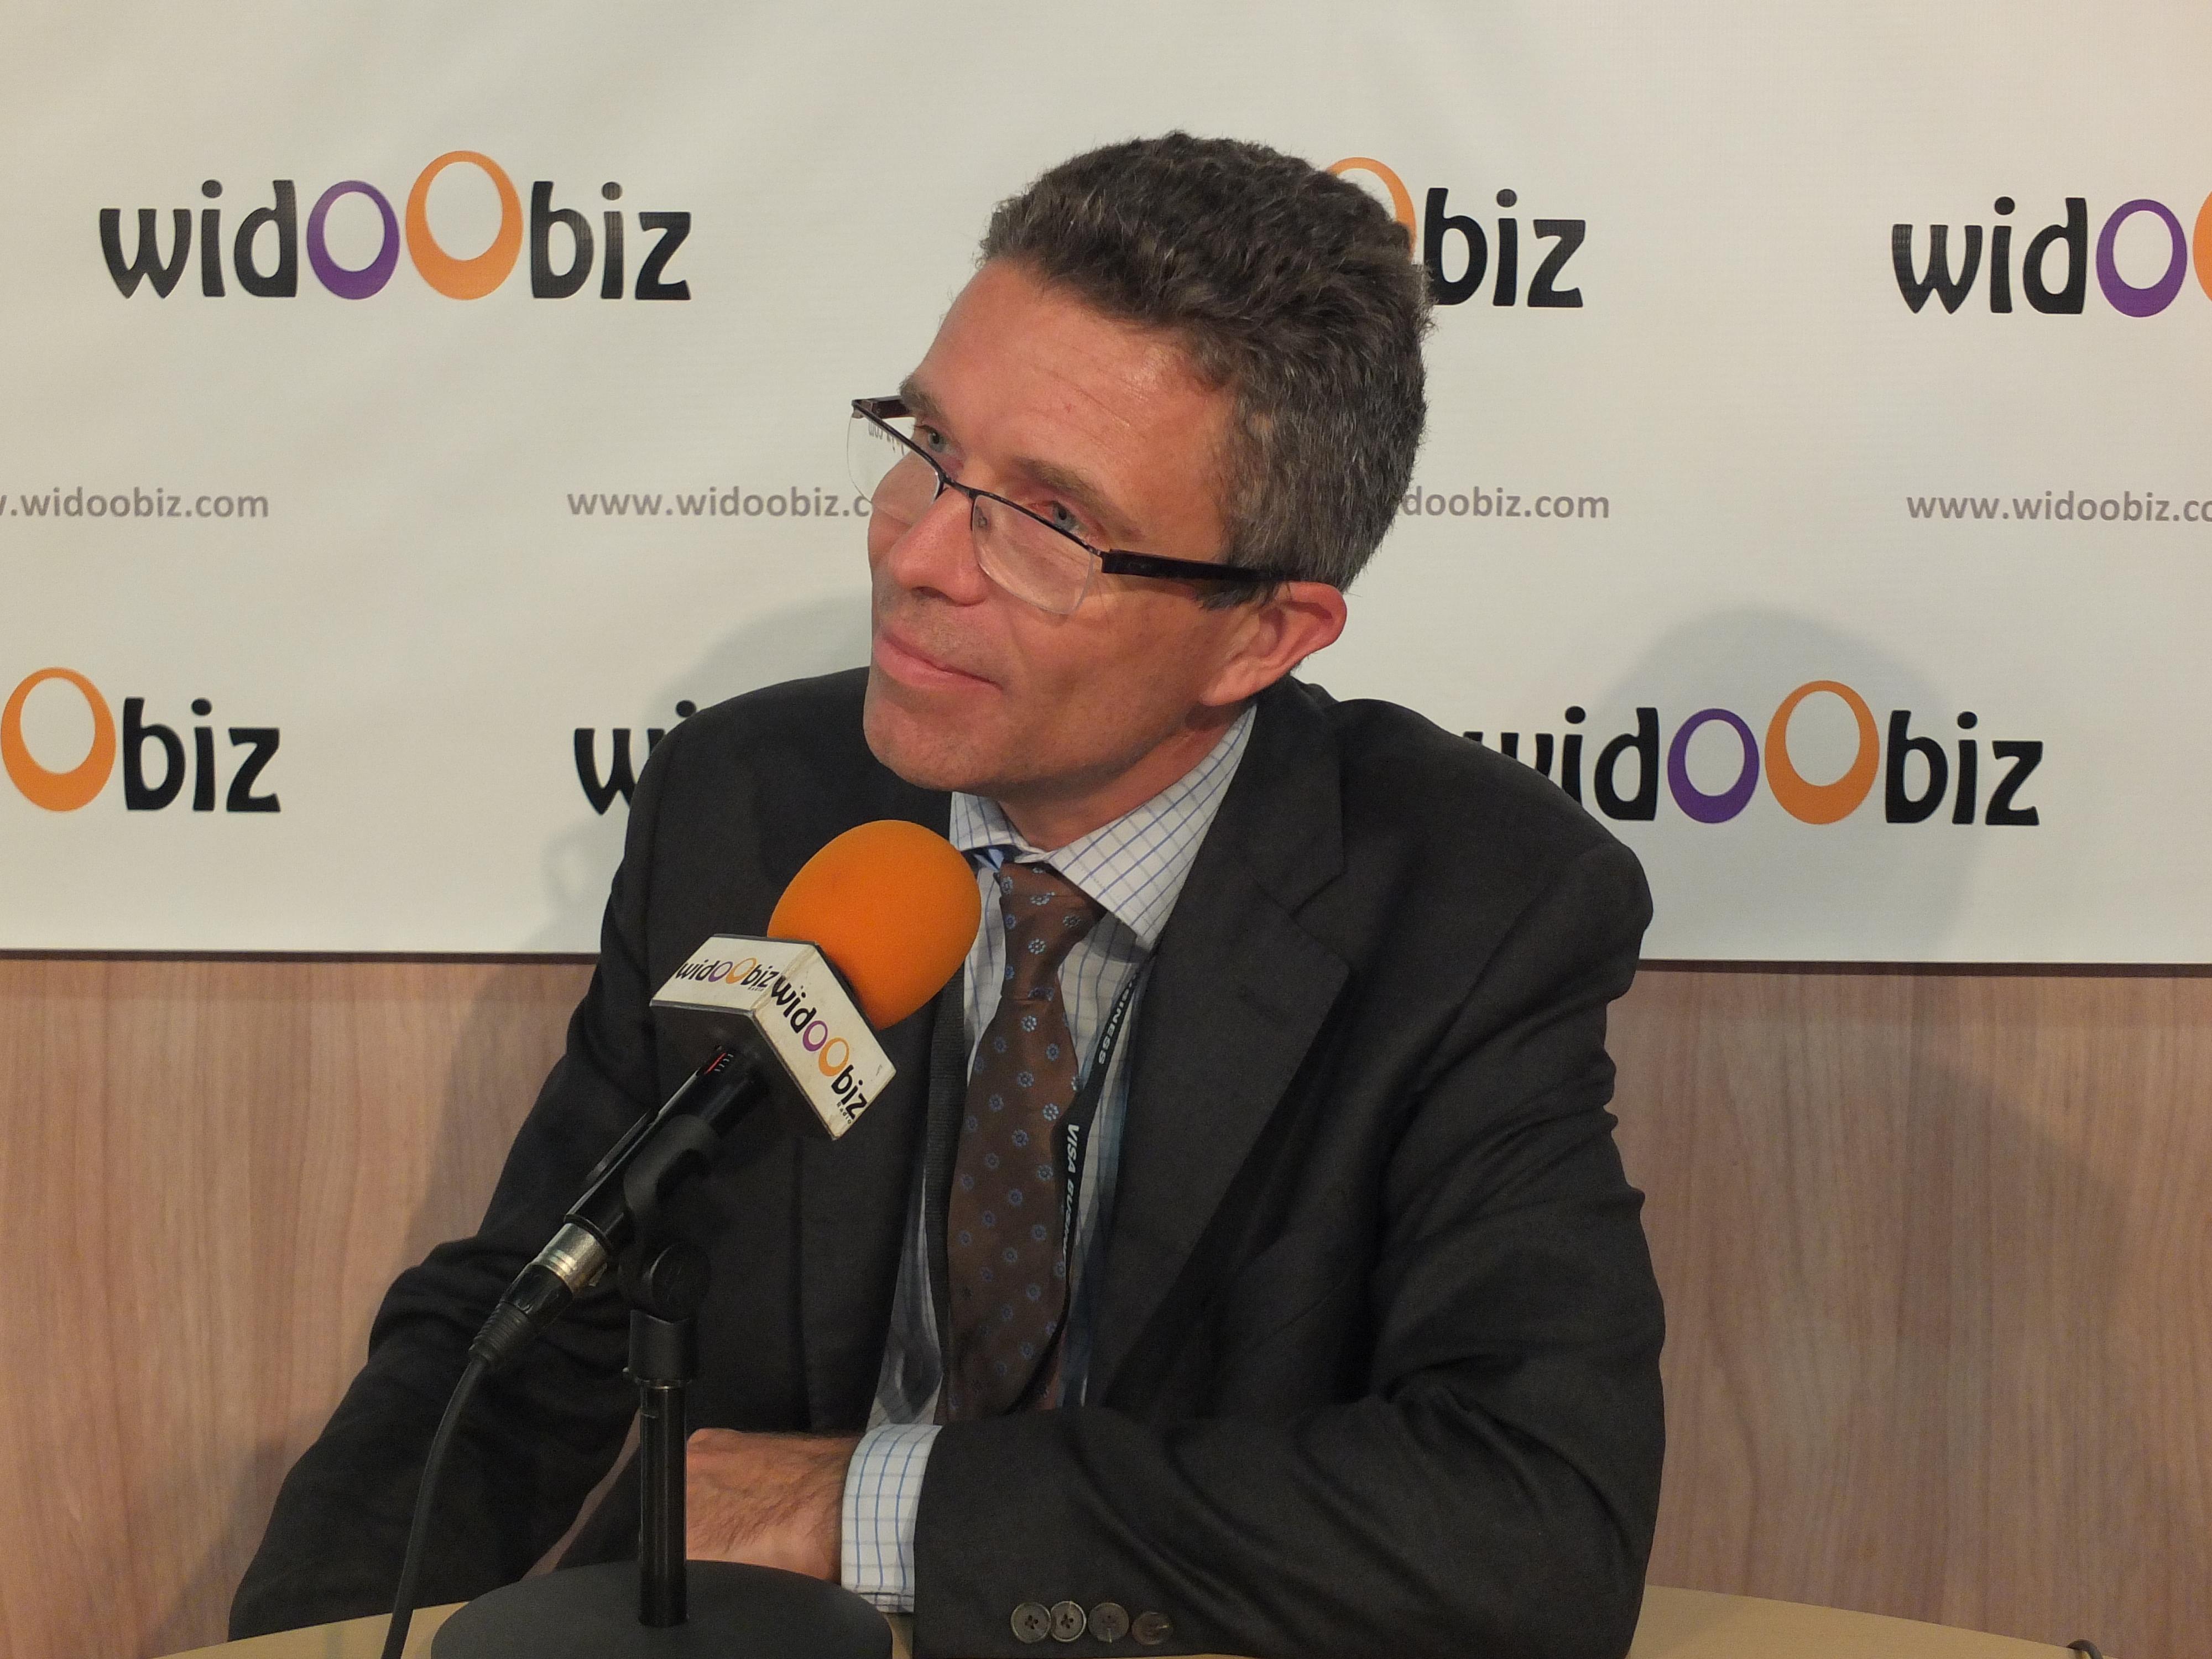 Guillaume Belan Président de JAM, portage salarial